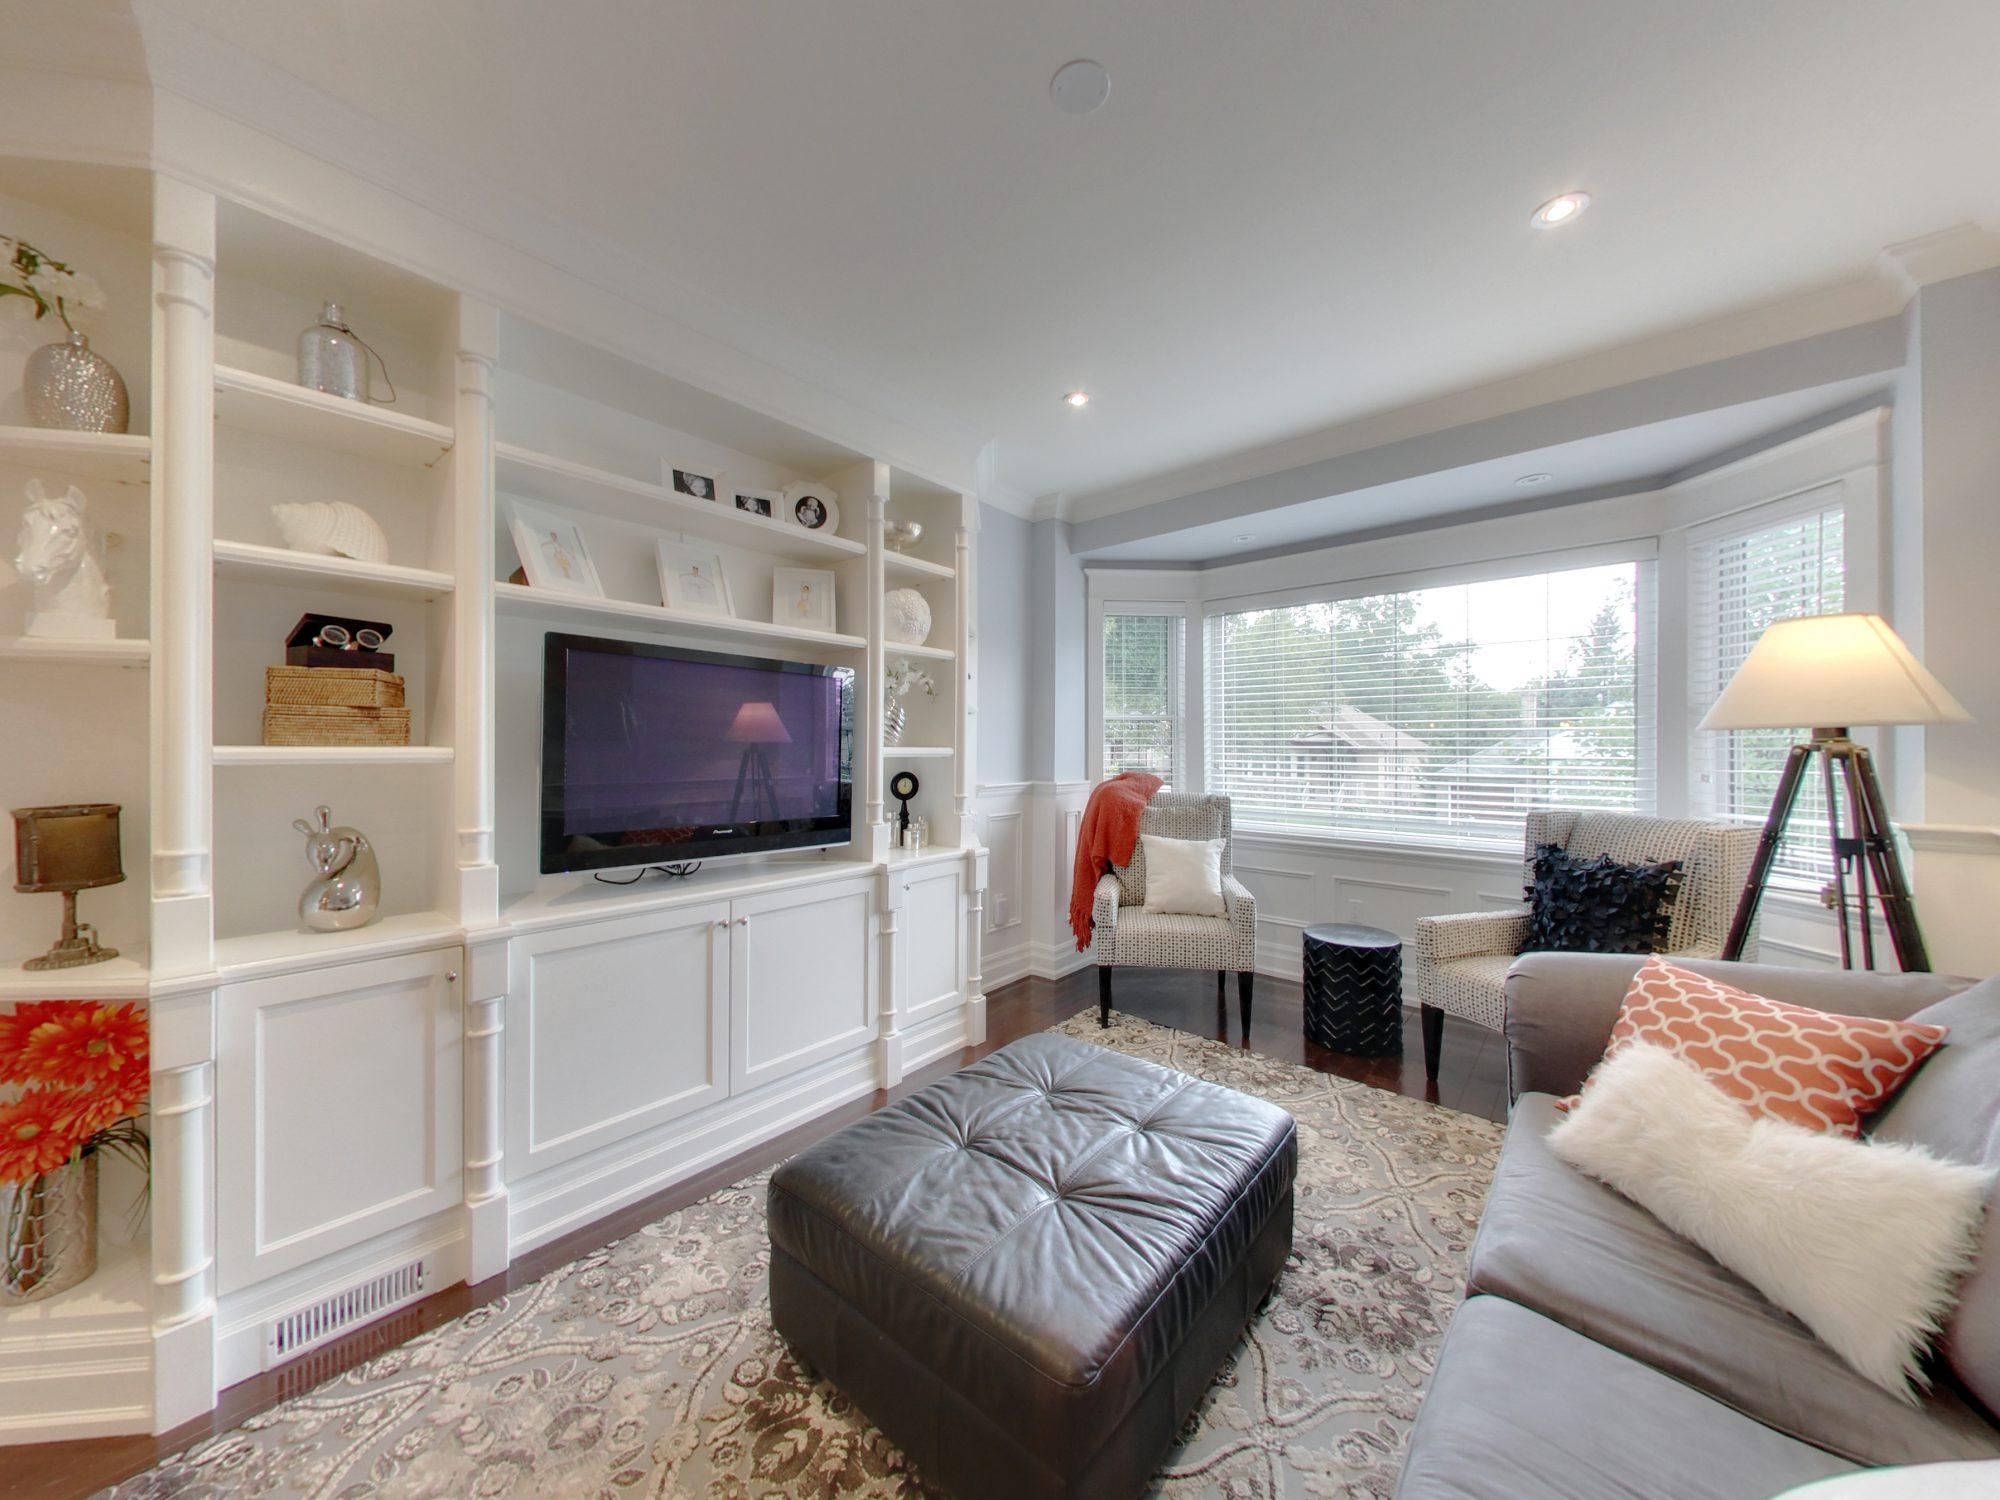 toronto-house-for-sale-15-shand-avenue-3